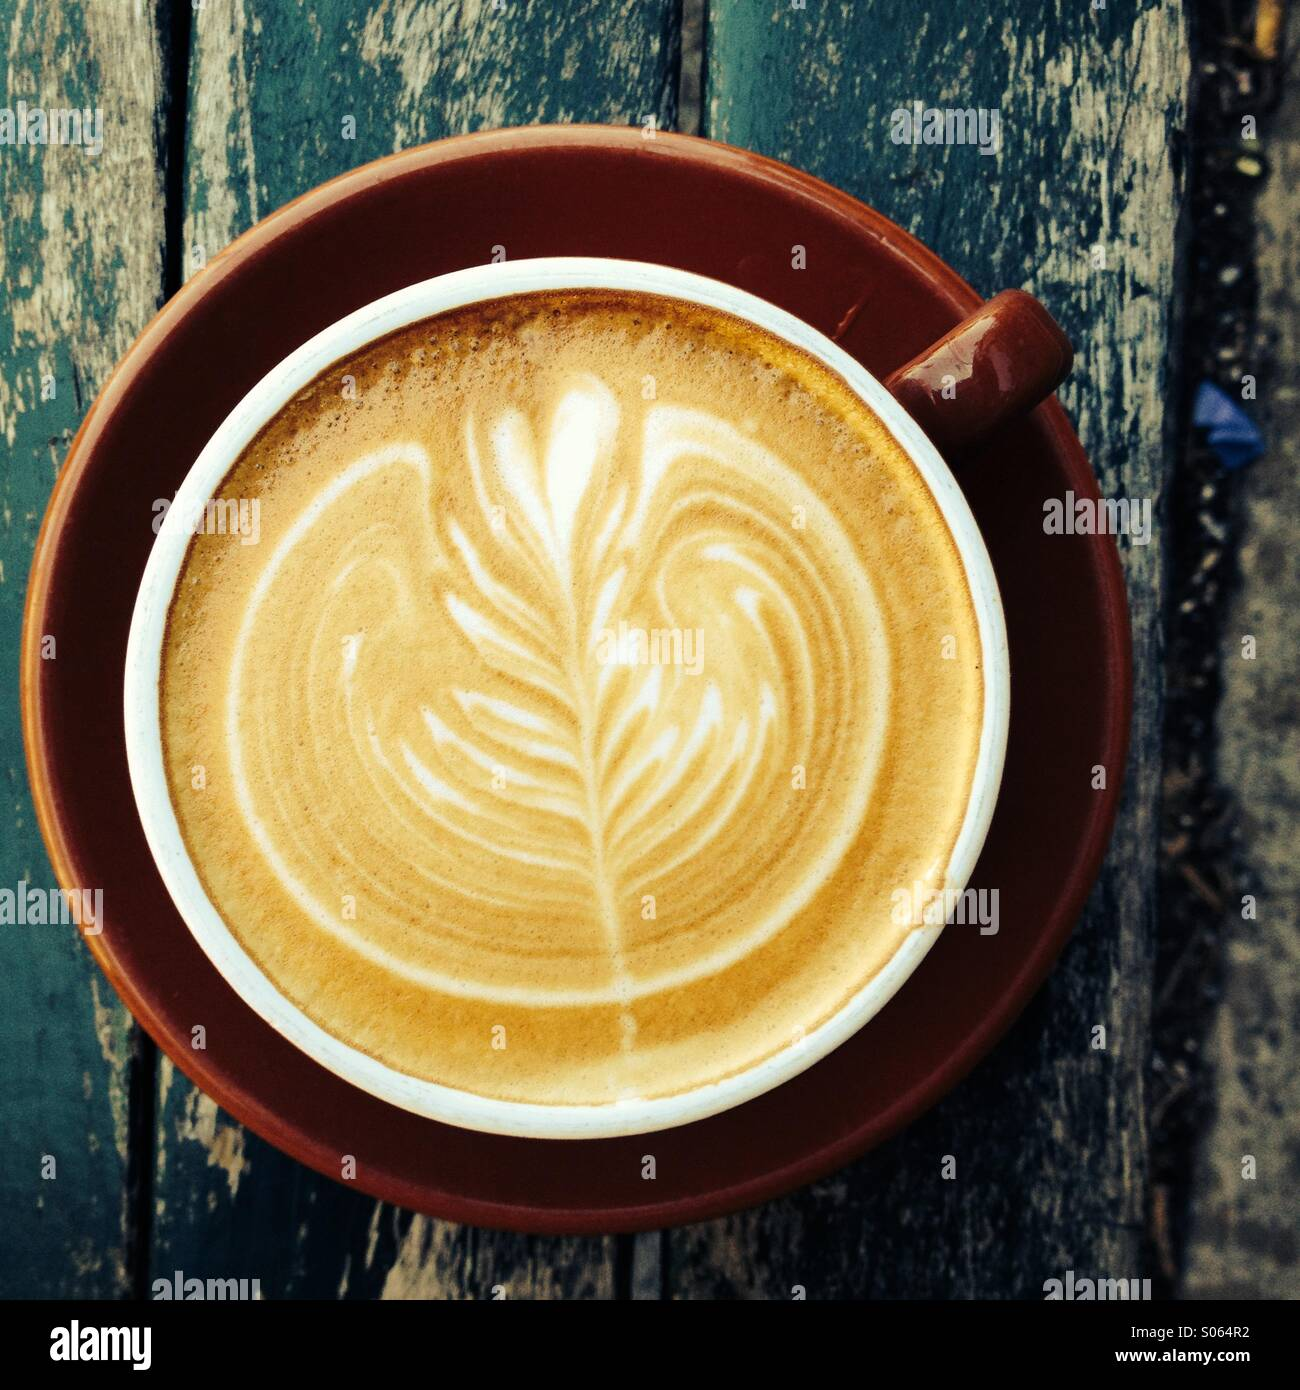 Coffee - Stock Image